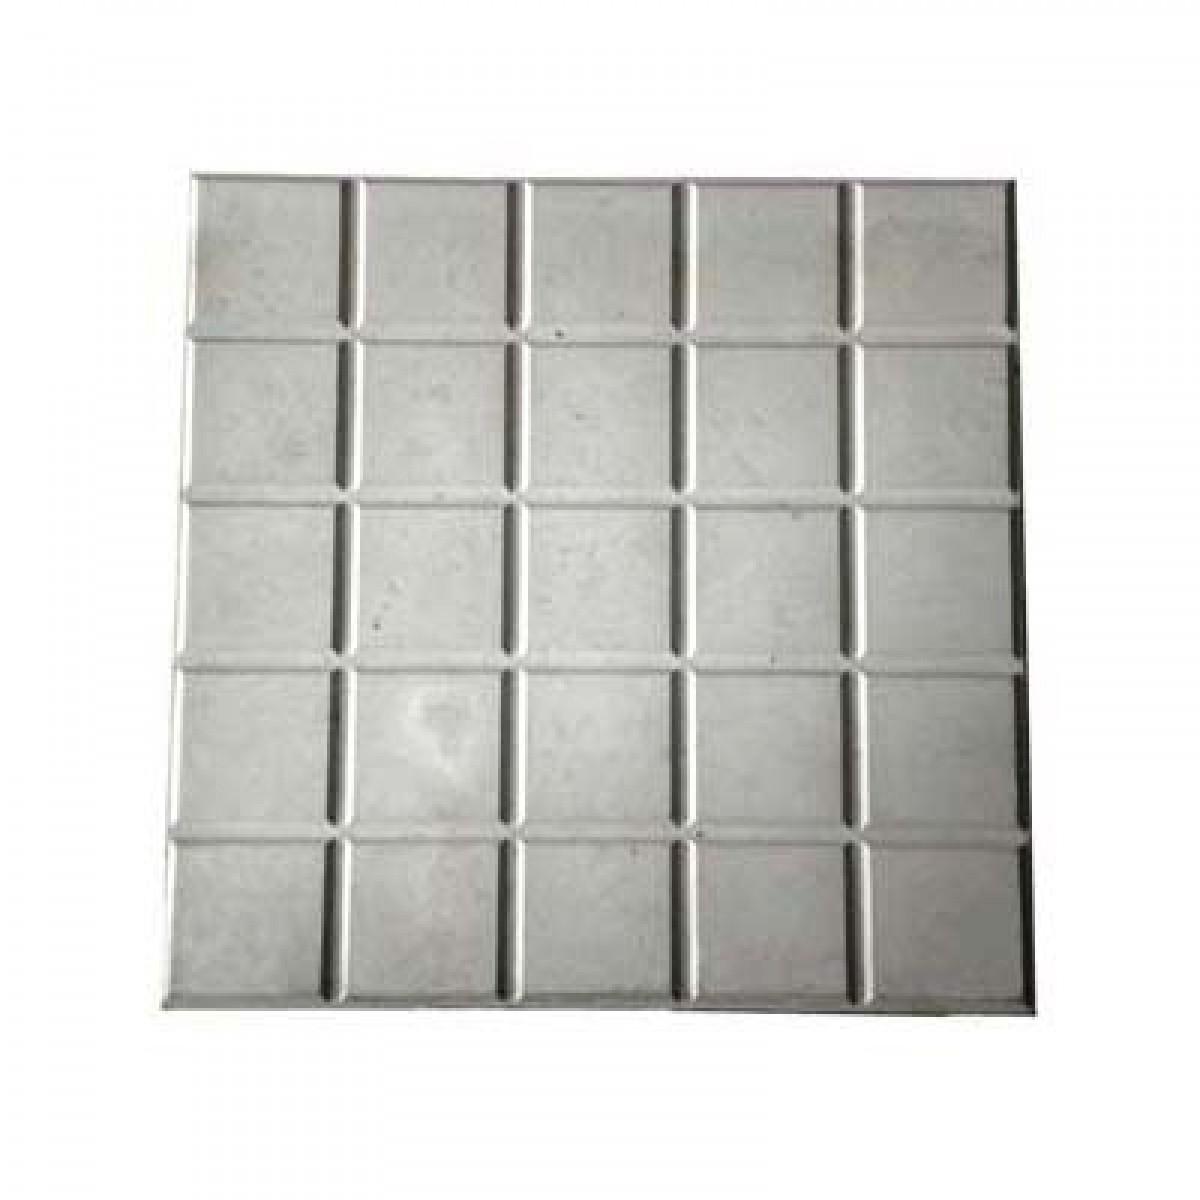 Foto5 - Forma Plástica Para Ladrilho Xadrez 25 Quadros FP044 20X20X1,5 Rendimento 25PÇAS P/M²